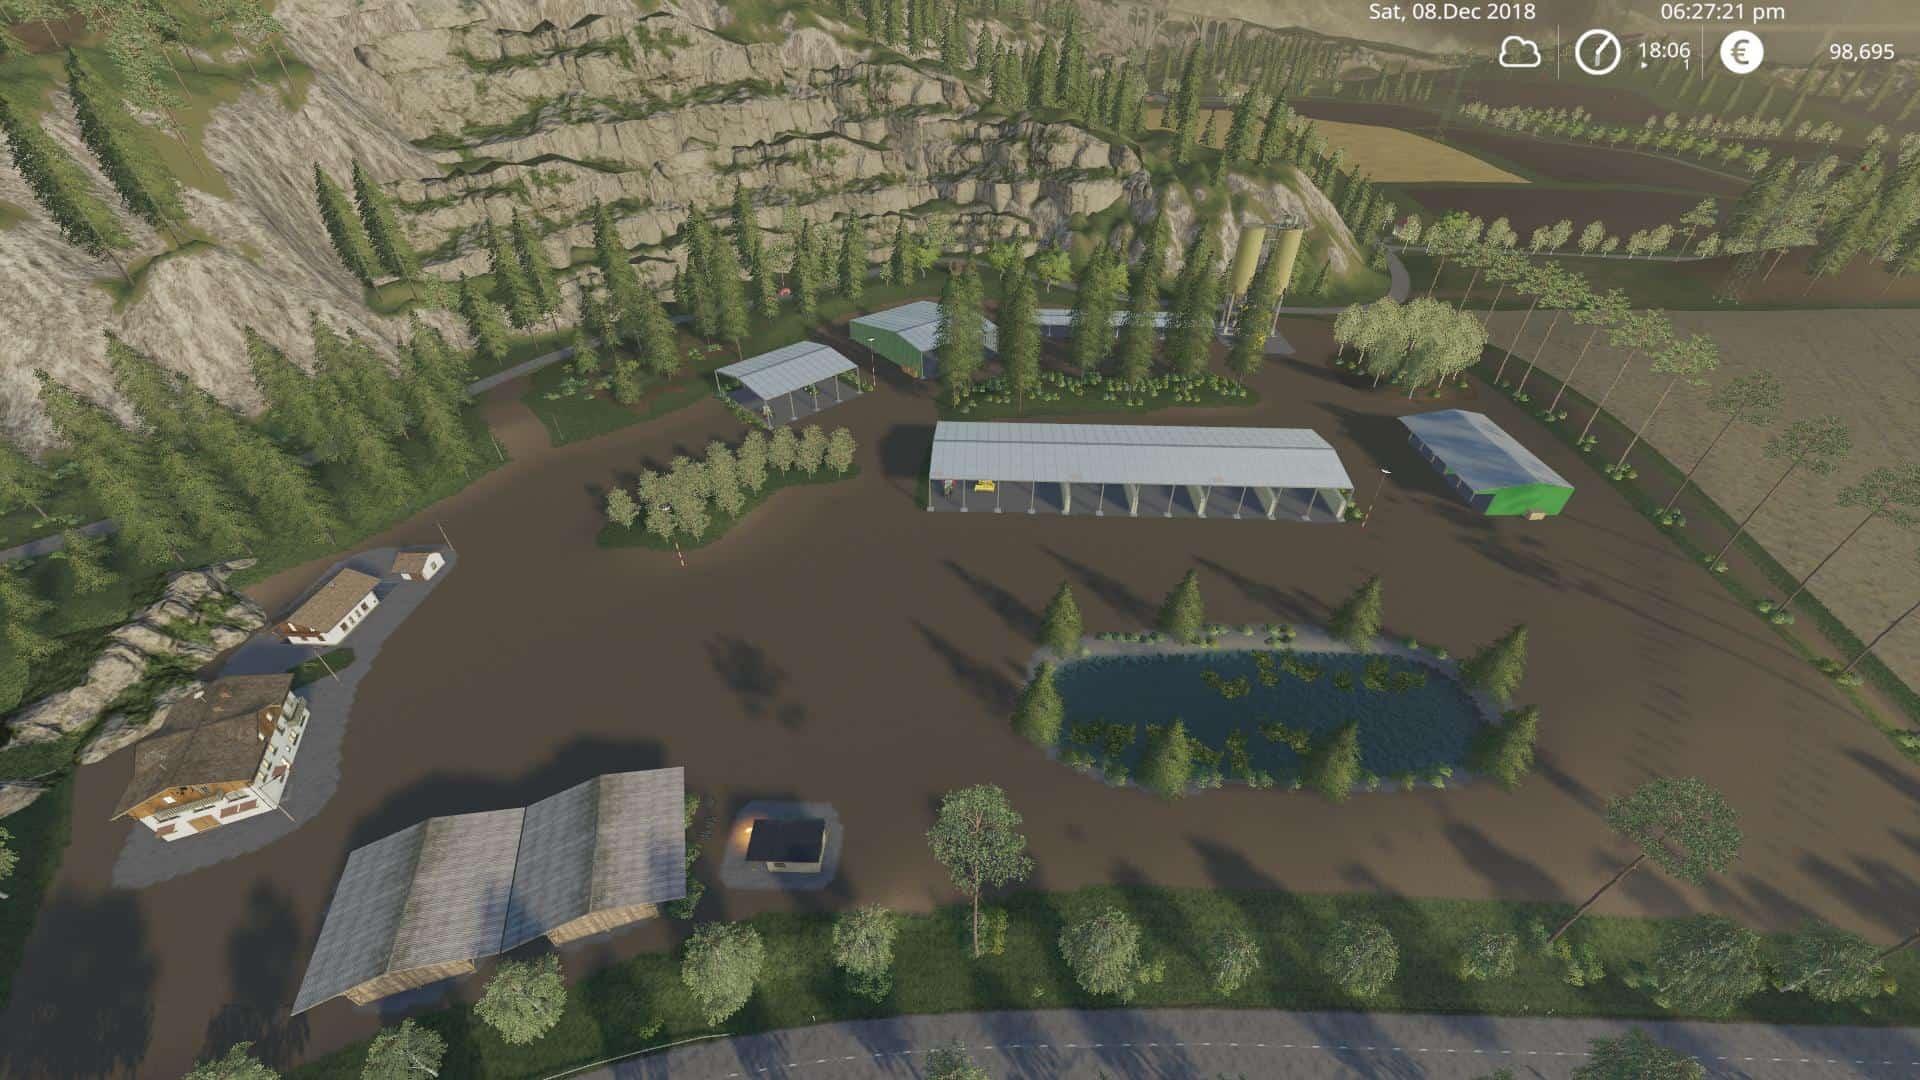 ETA La Prairie Ardennaise v1 0 Map Mod - Farming simulator 17 / 2017 mod